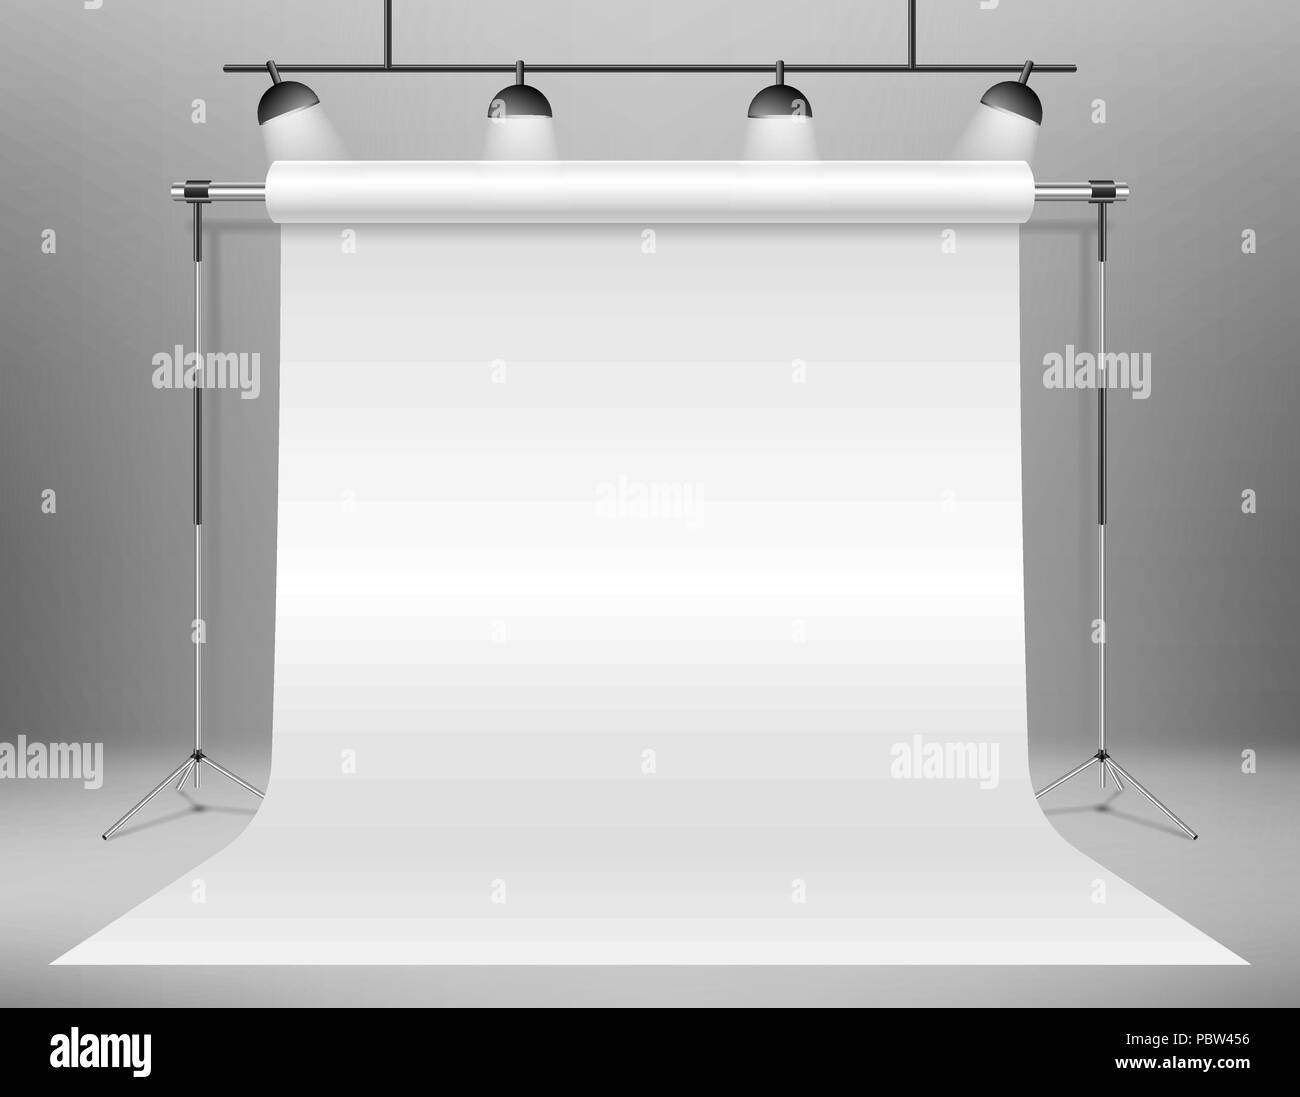 Realistic empty white photo studio backdrop template. photographer studio backdrop stand with Spotlights. Vector illustration. - Stock Vector